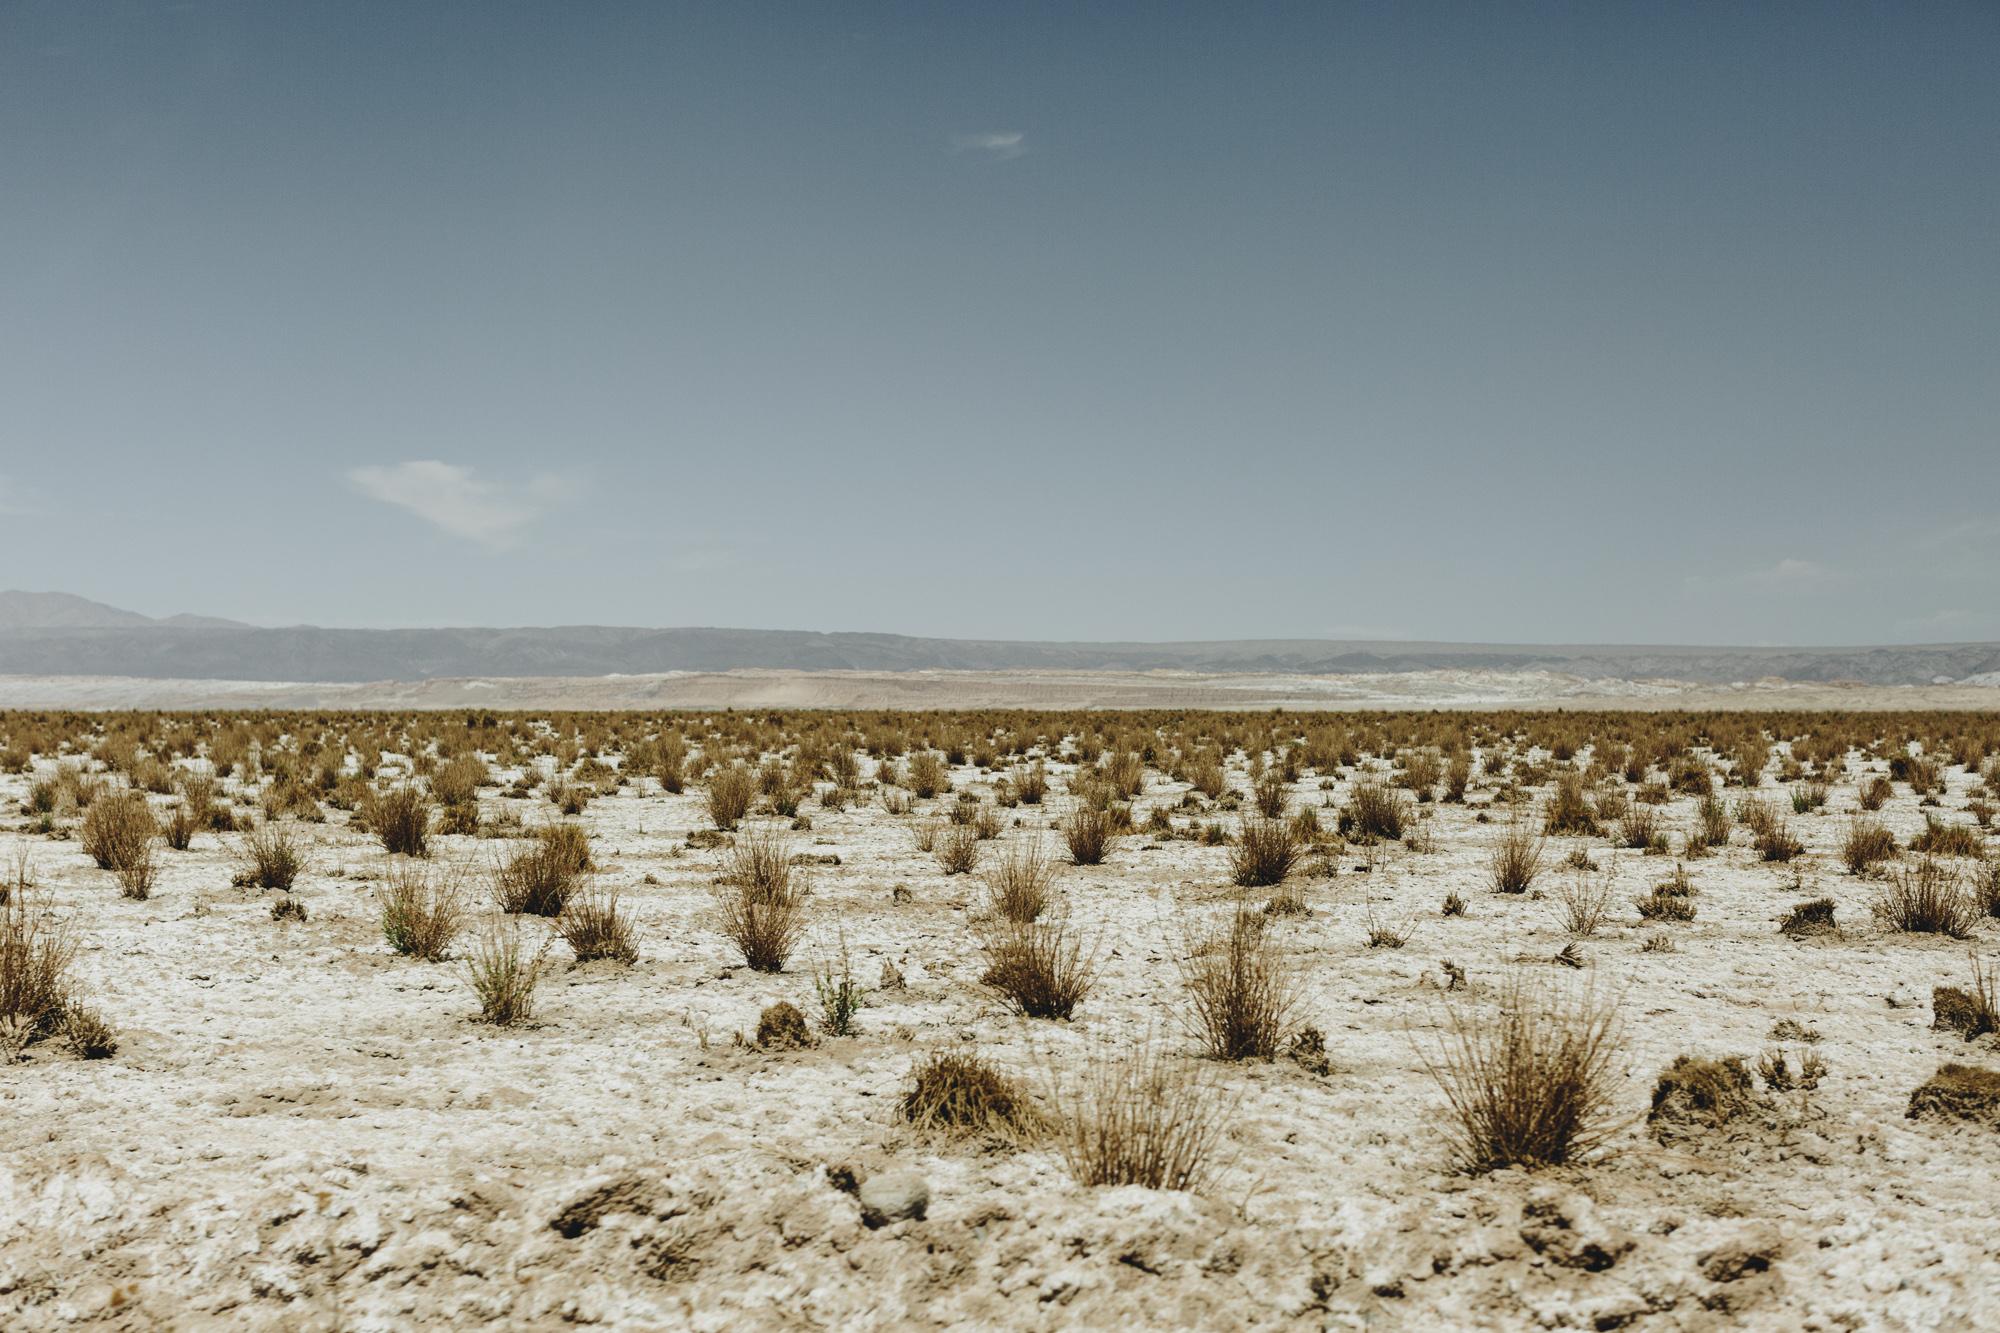 Mael Lambla photographer Chile San pedro atacama desert-41.jpg